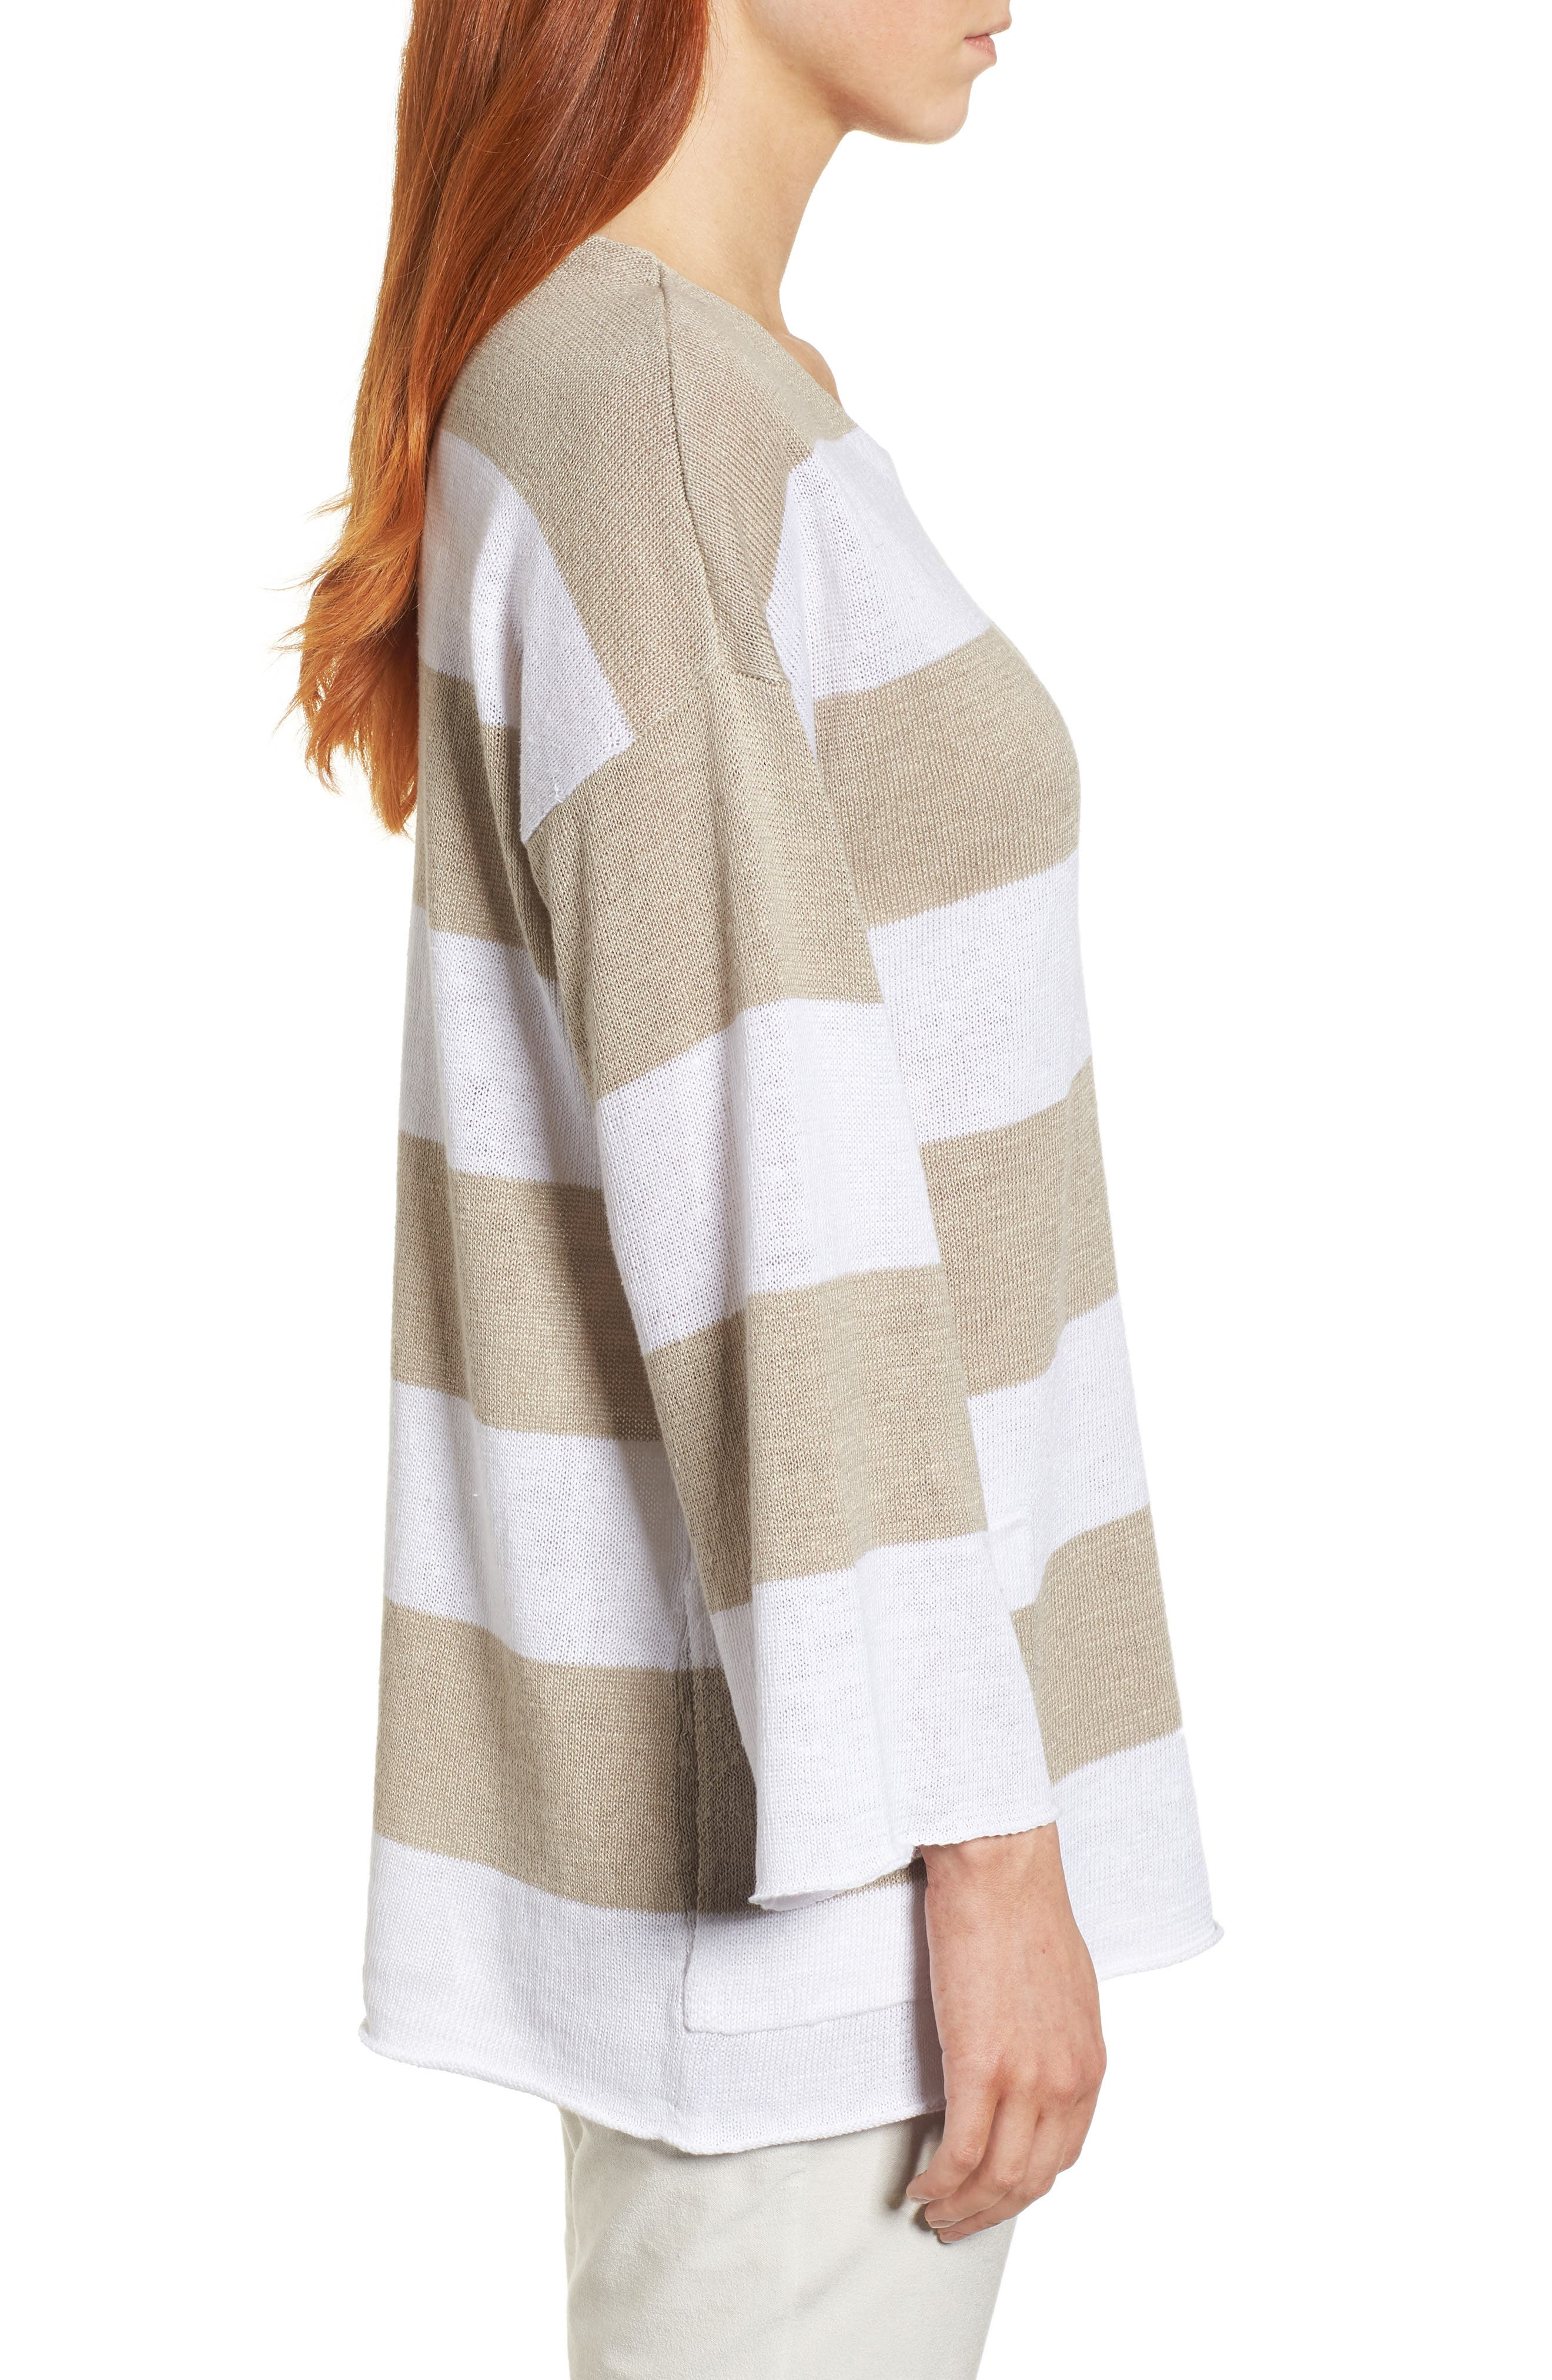 Stripe Organic Linen Knit A-Line Top,                             Alternate thumbnail 3, color,                             White/ Natural